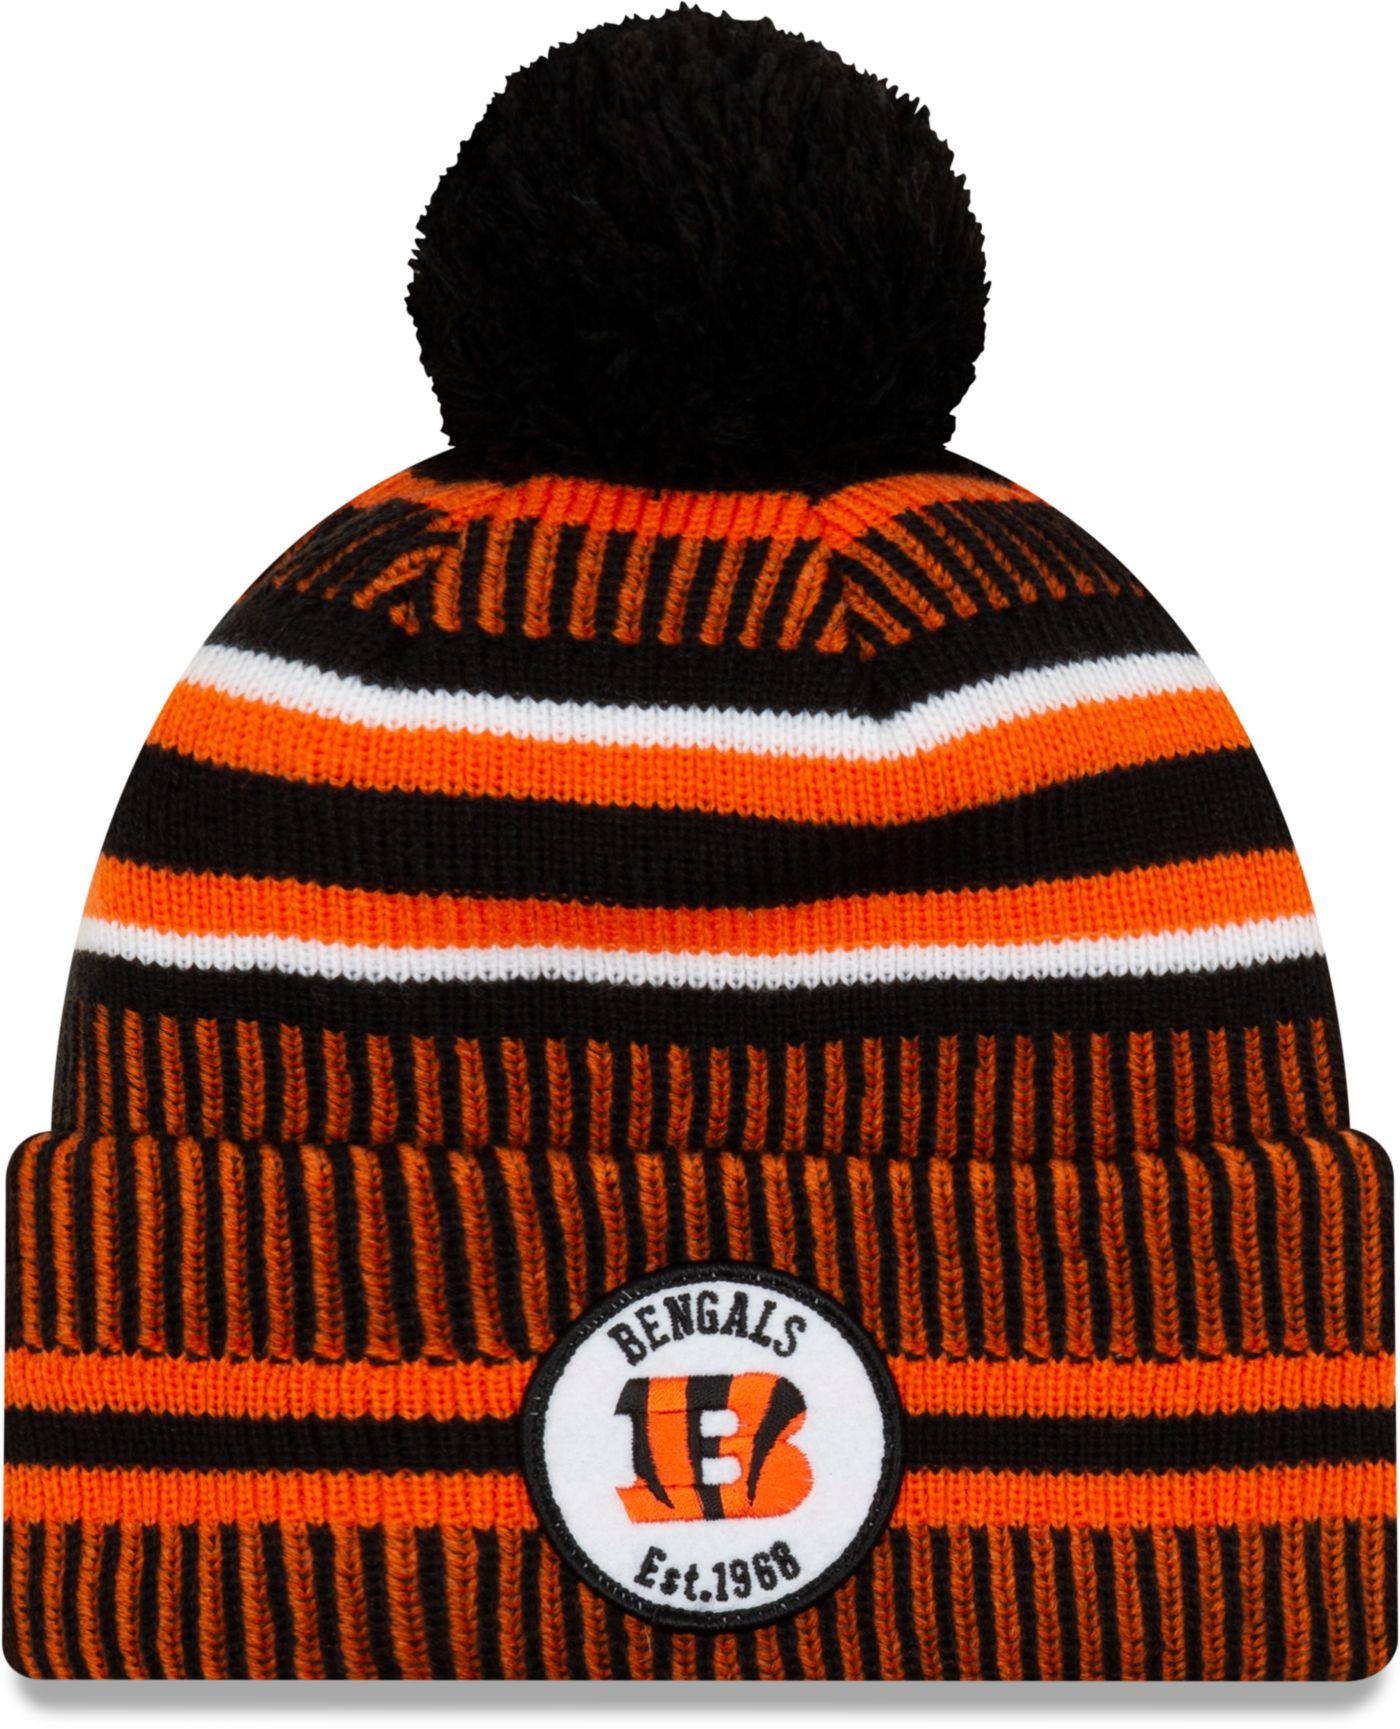 New Era Men's Cincinnati Bengals Sideline Home Sport Pom Knit